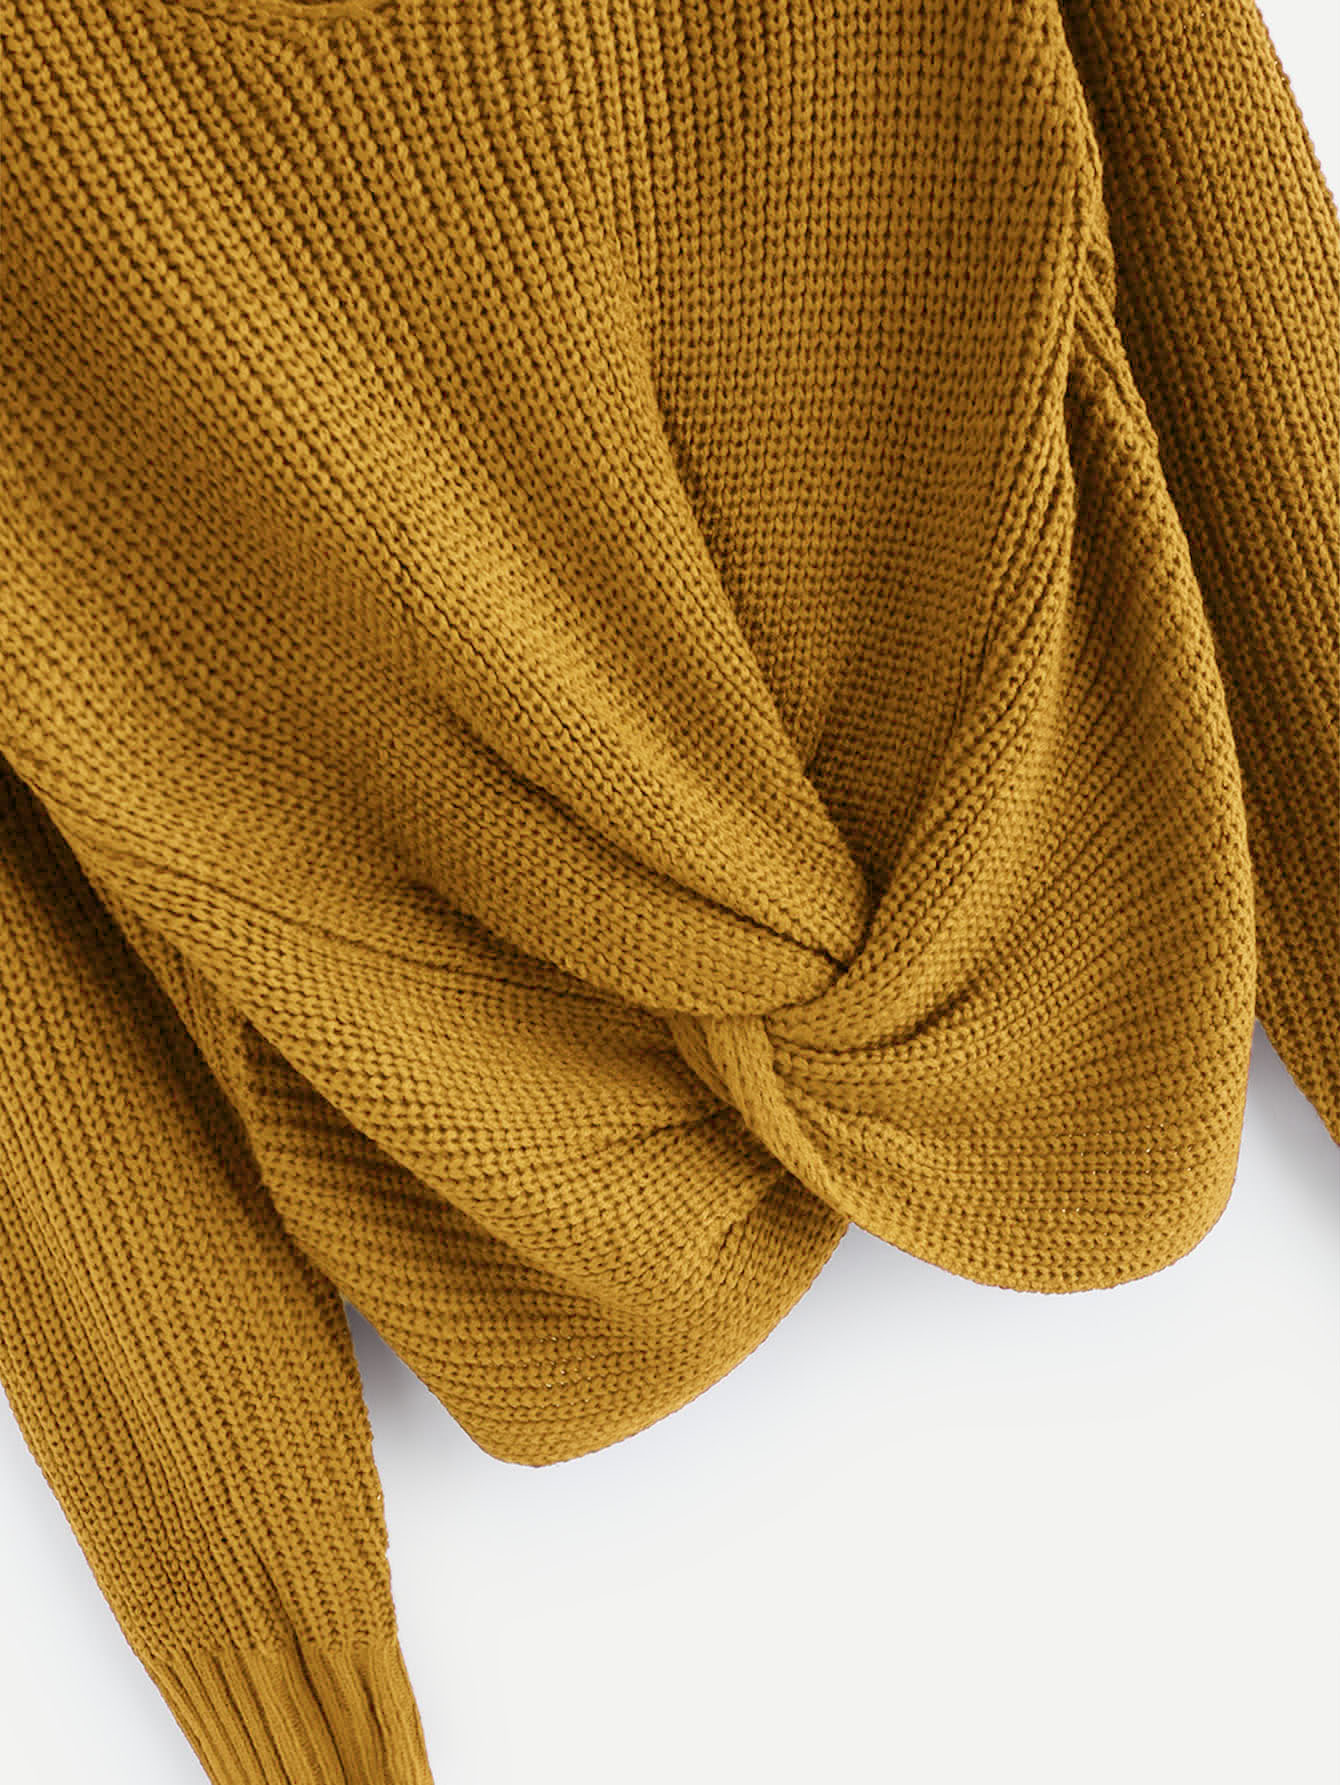 5f4927872d V-neckline Twist Front Chunky Knit Sweater -SheIn(Sheinside)